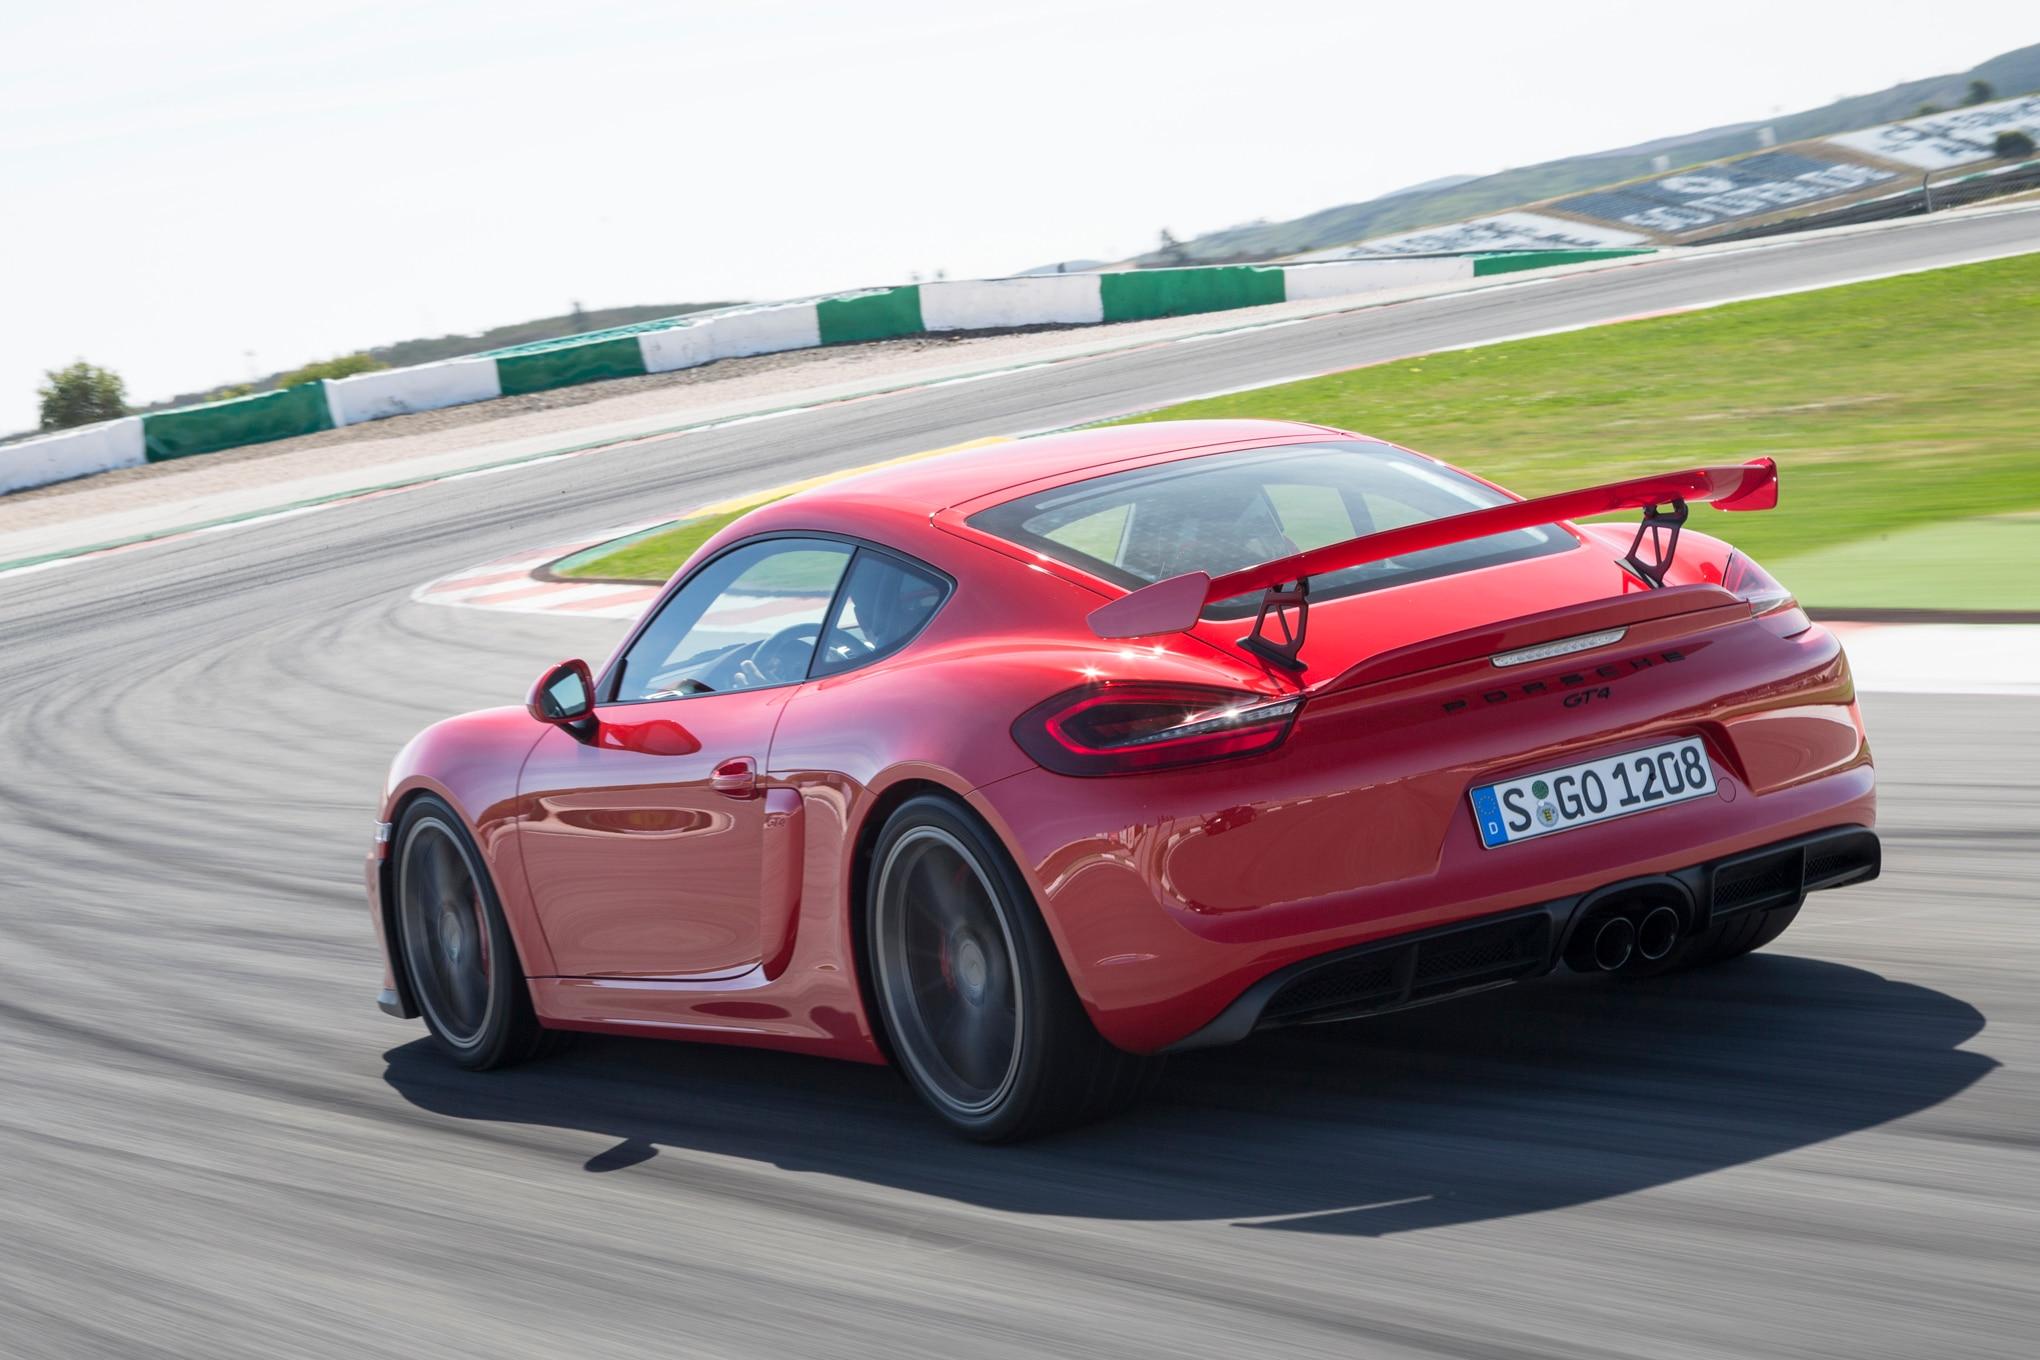 2016 Porsche Cayman GT4 Rear Three Quarter In Motion 08